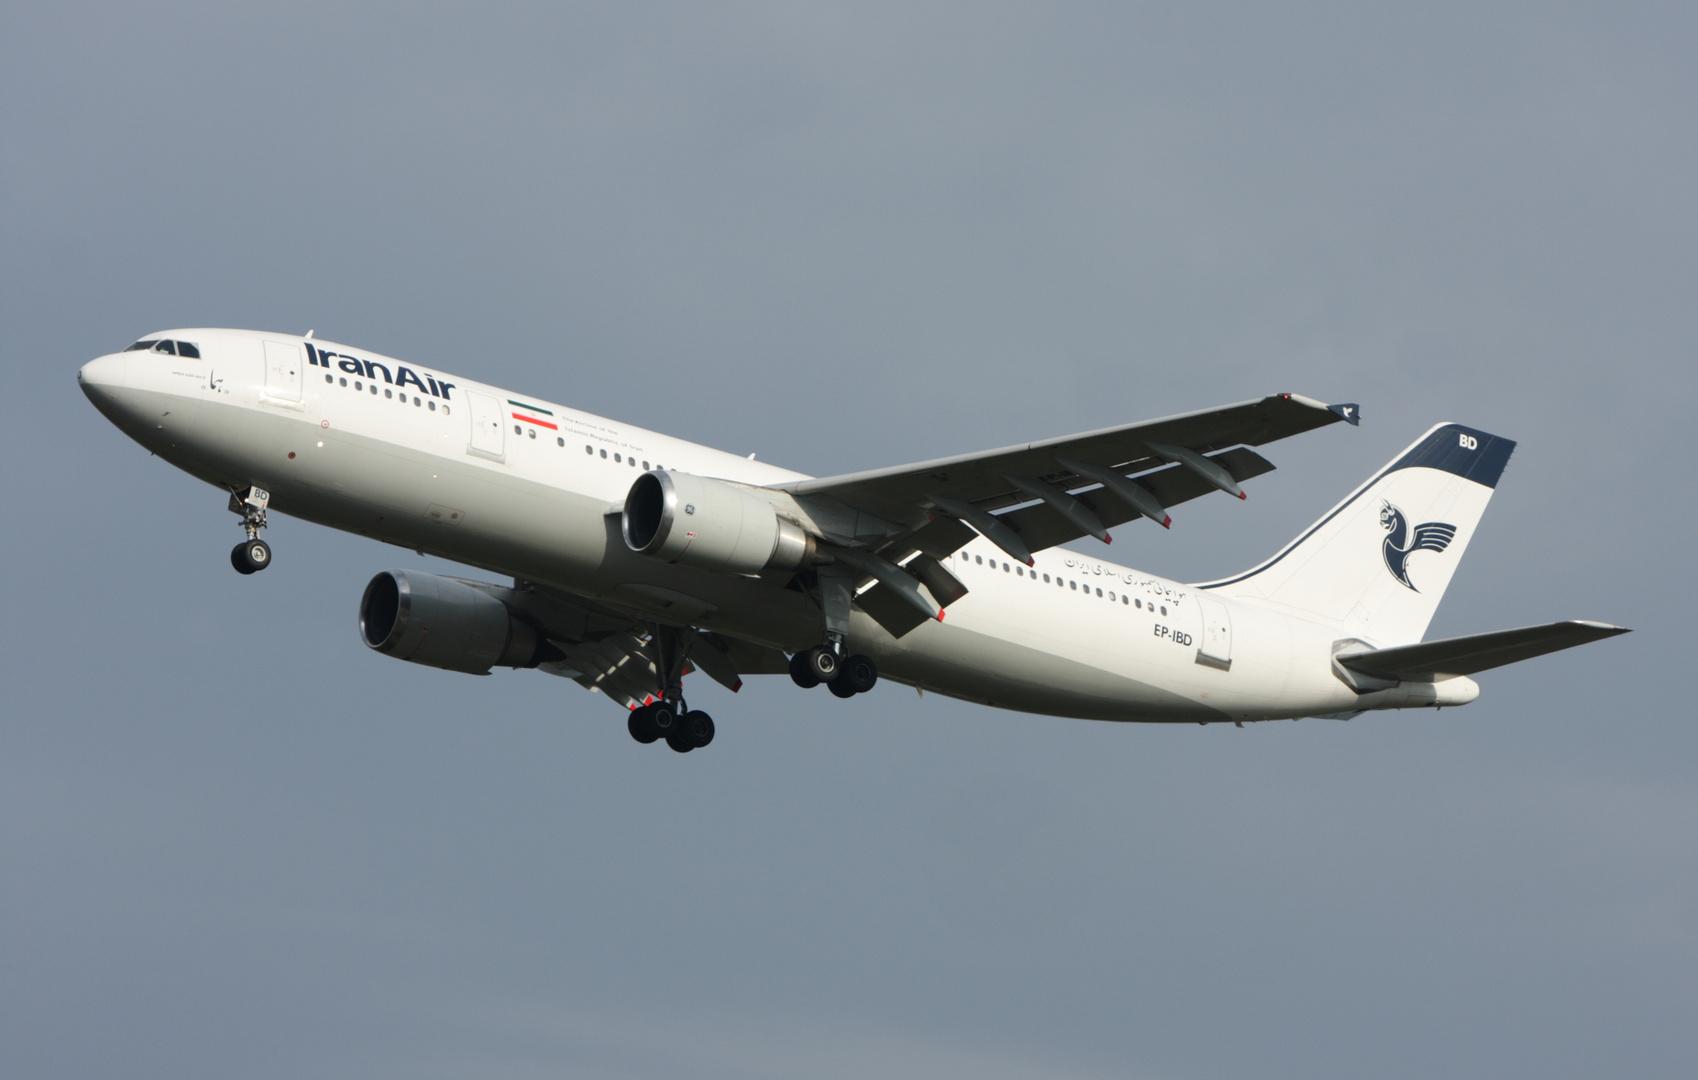 IranAir Airbus 300 B4-605R